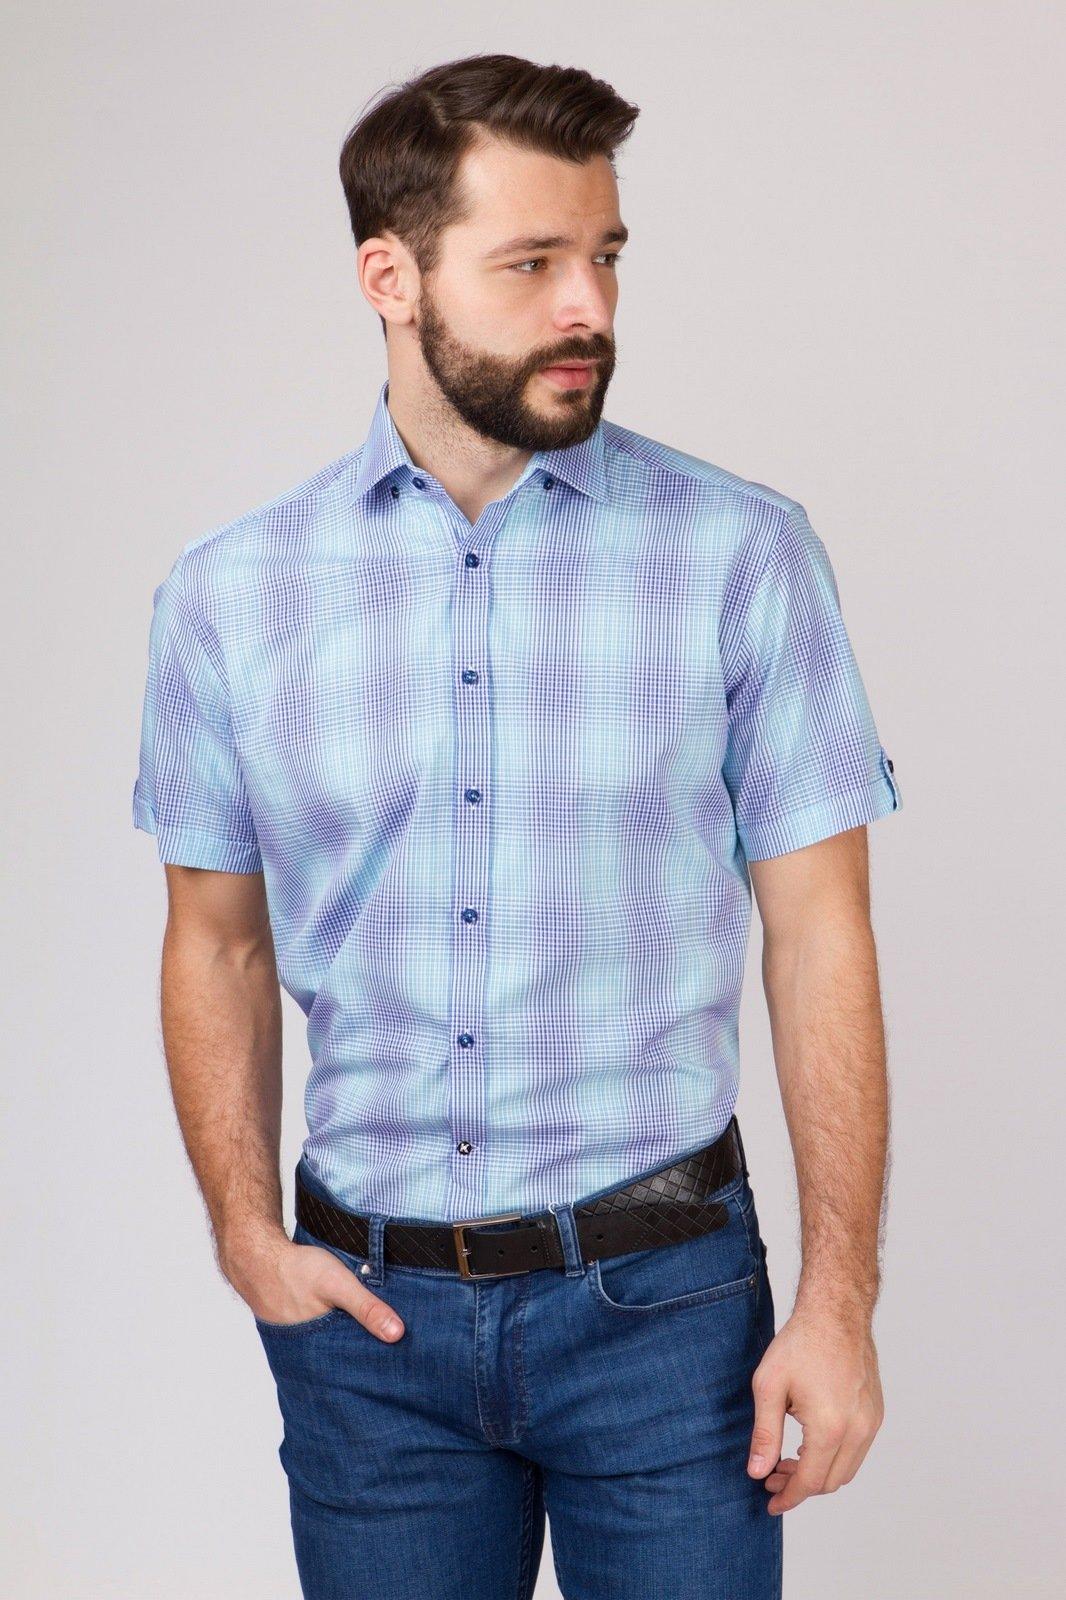 Рубашка прямая из хлопка с коротким рукавом KANZLER